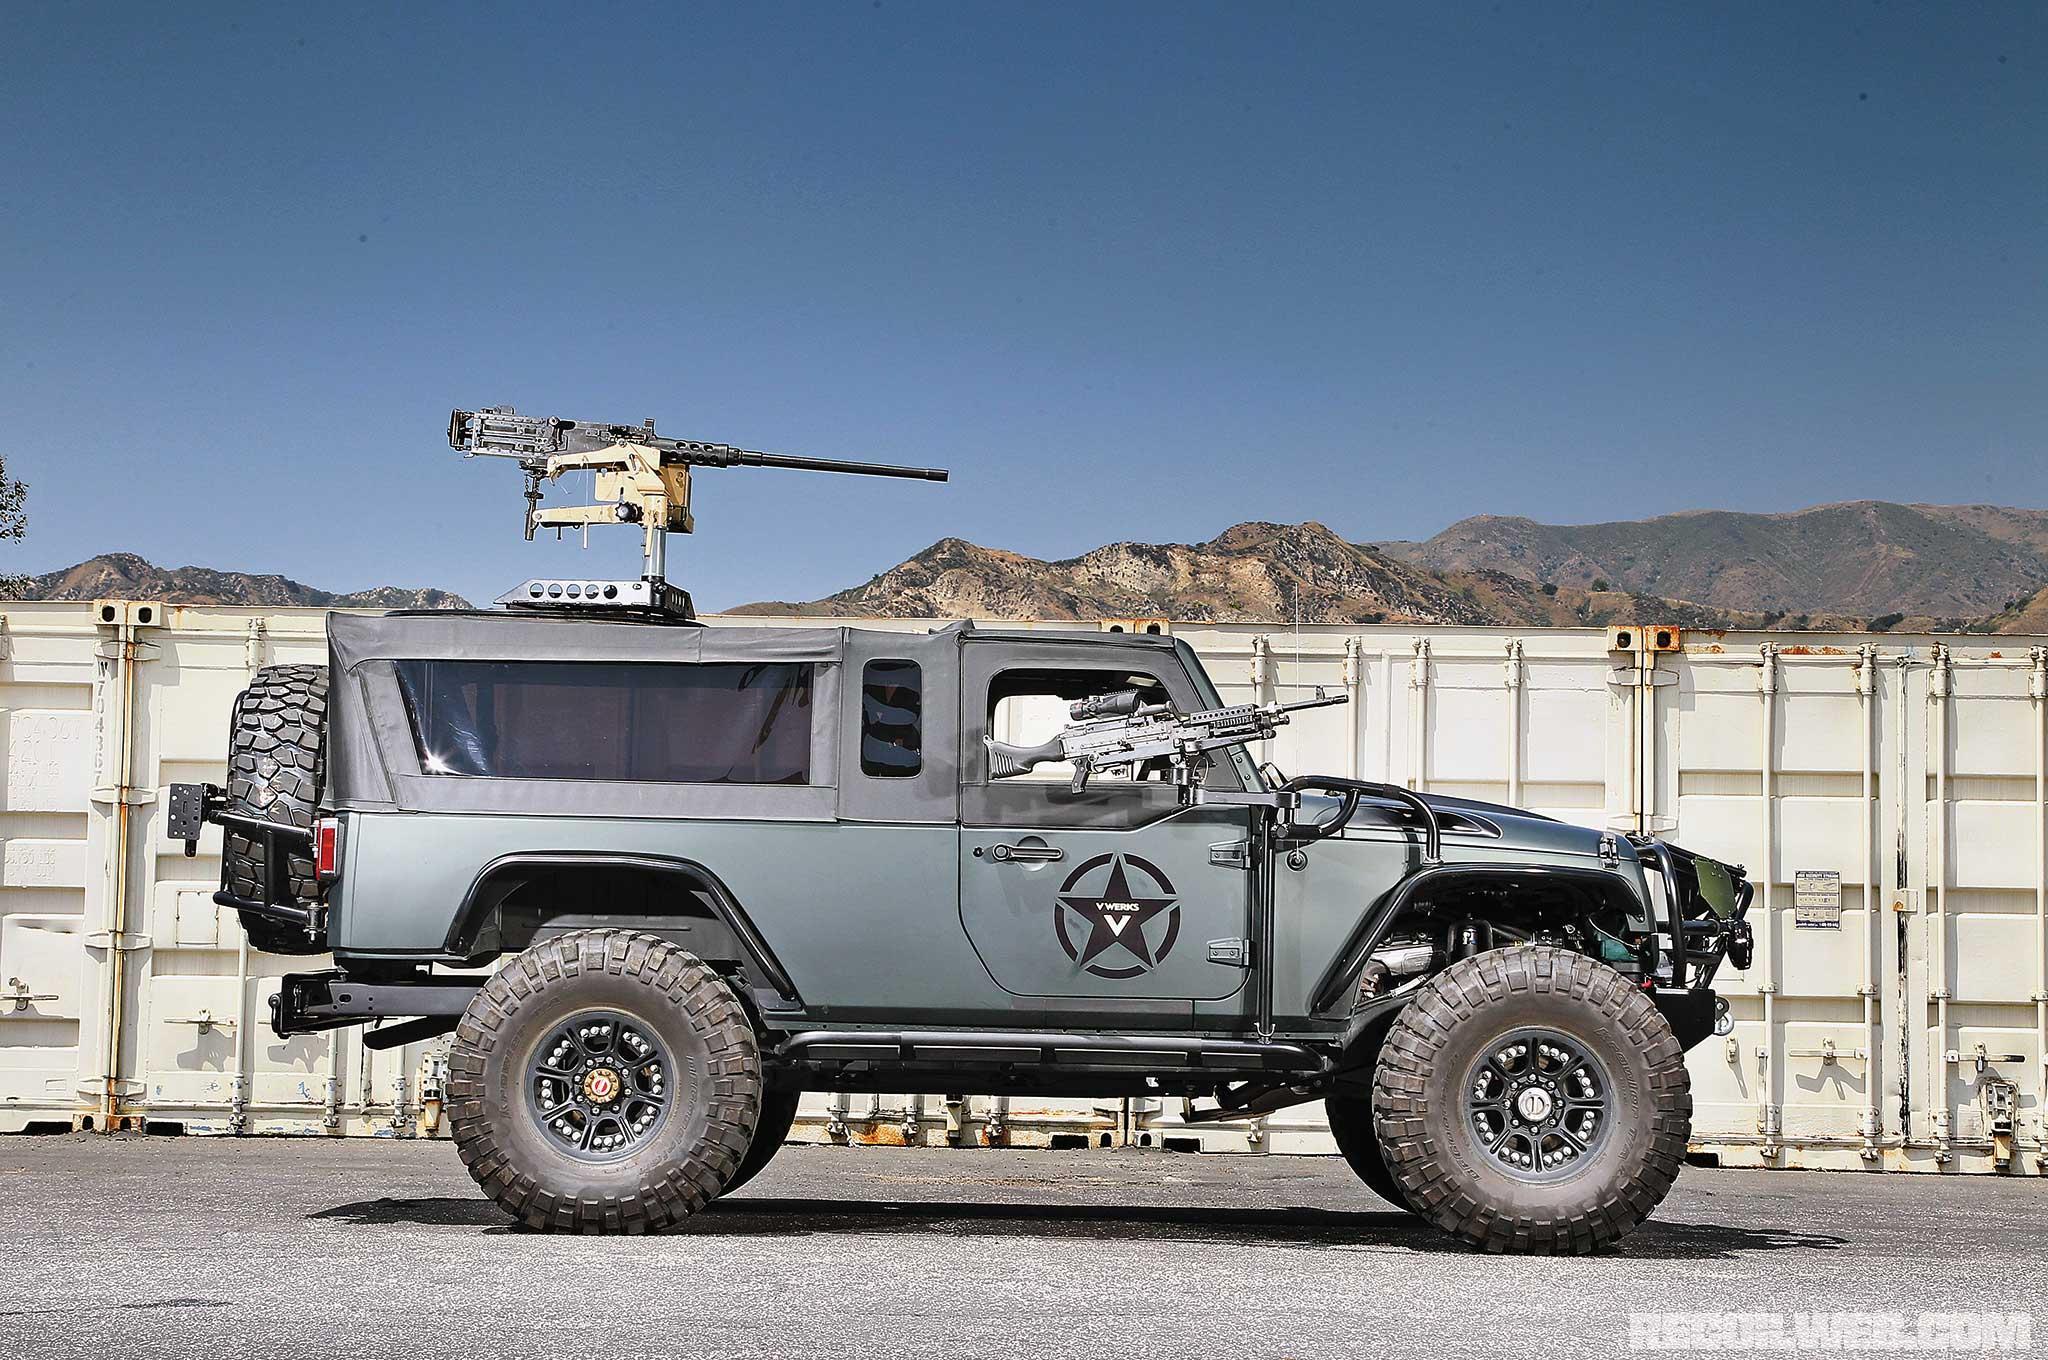 Jeep Wrangler Paint >> VWERKS Recon - Military Buildup